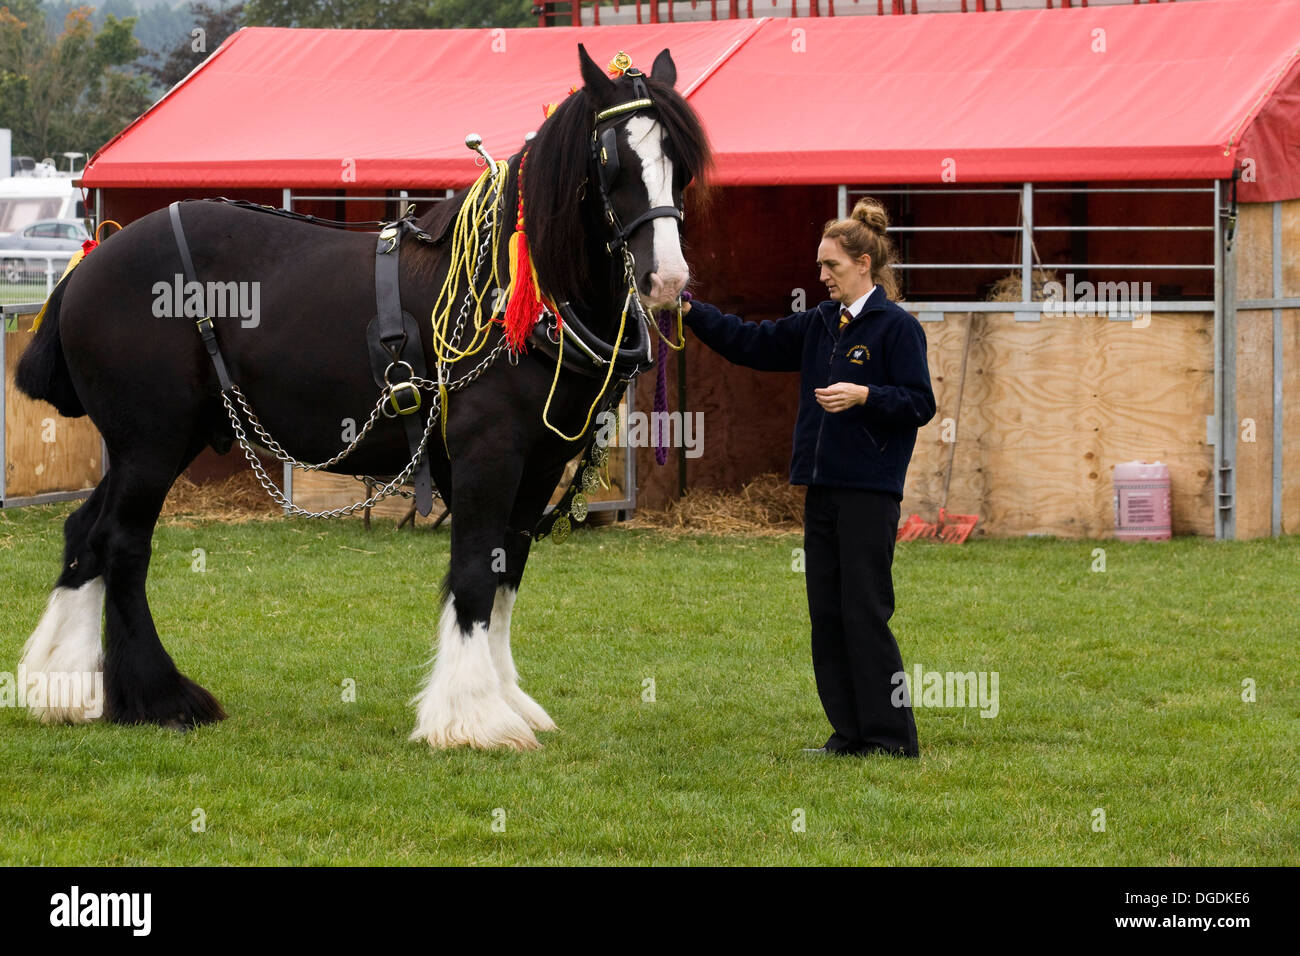 Shire Horses Pulling Plough Stockfotos & Shire Horses Pulling Plough ...